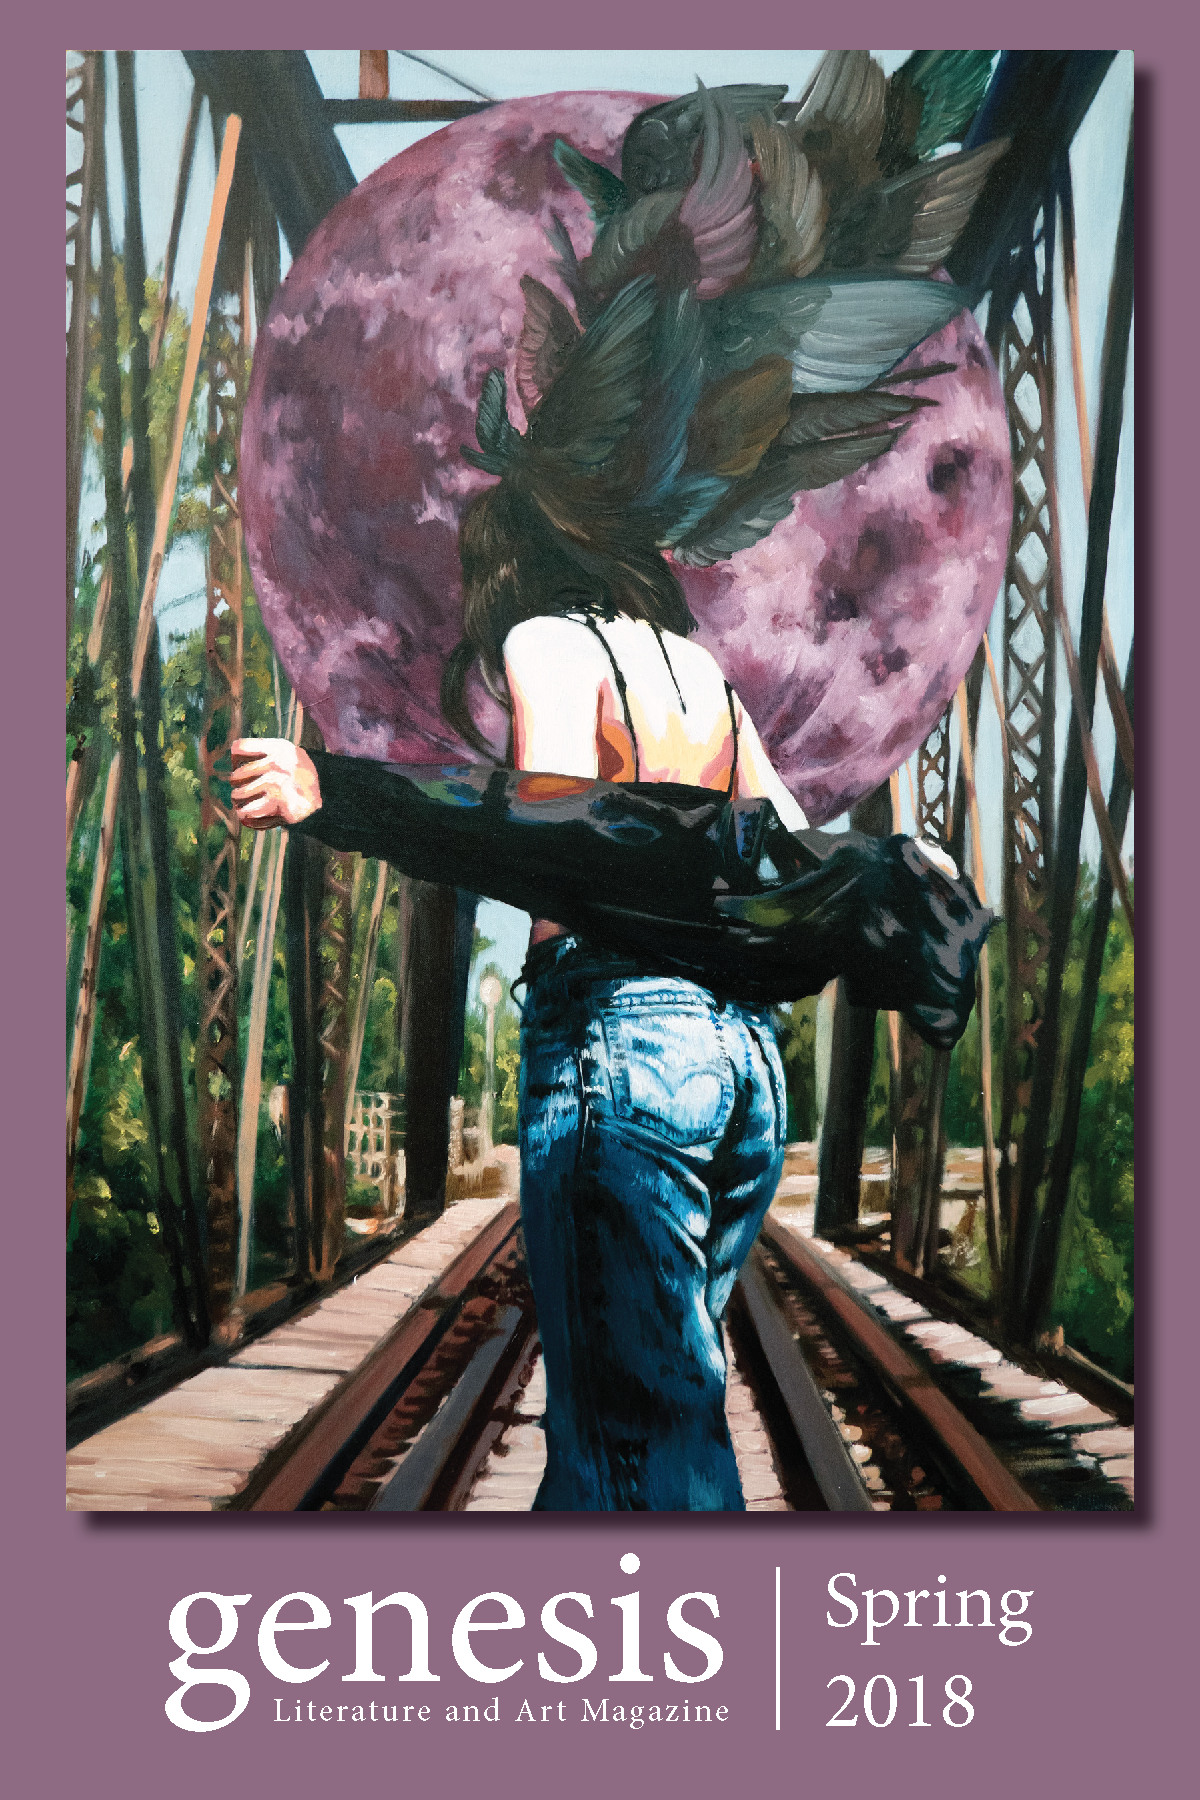 genesis spring 2018 cover